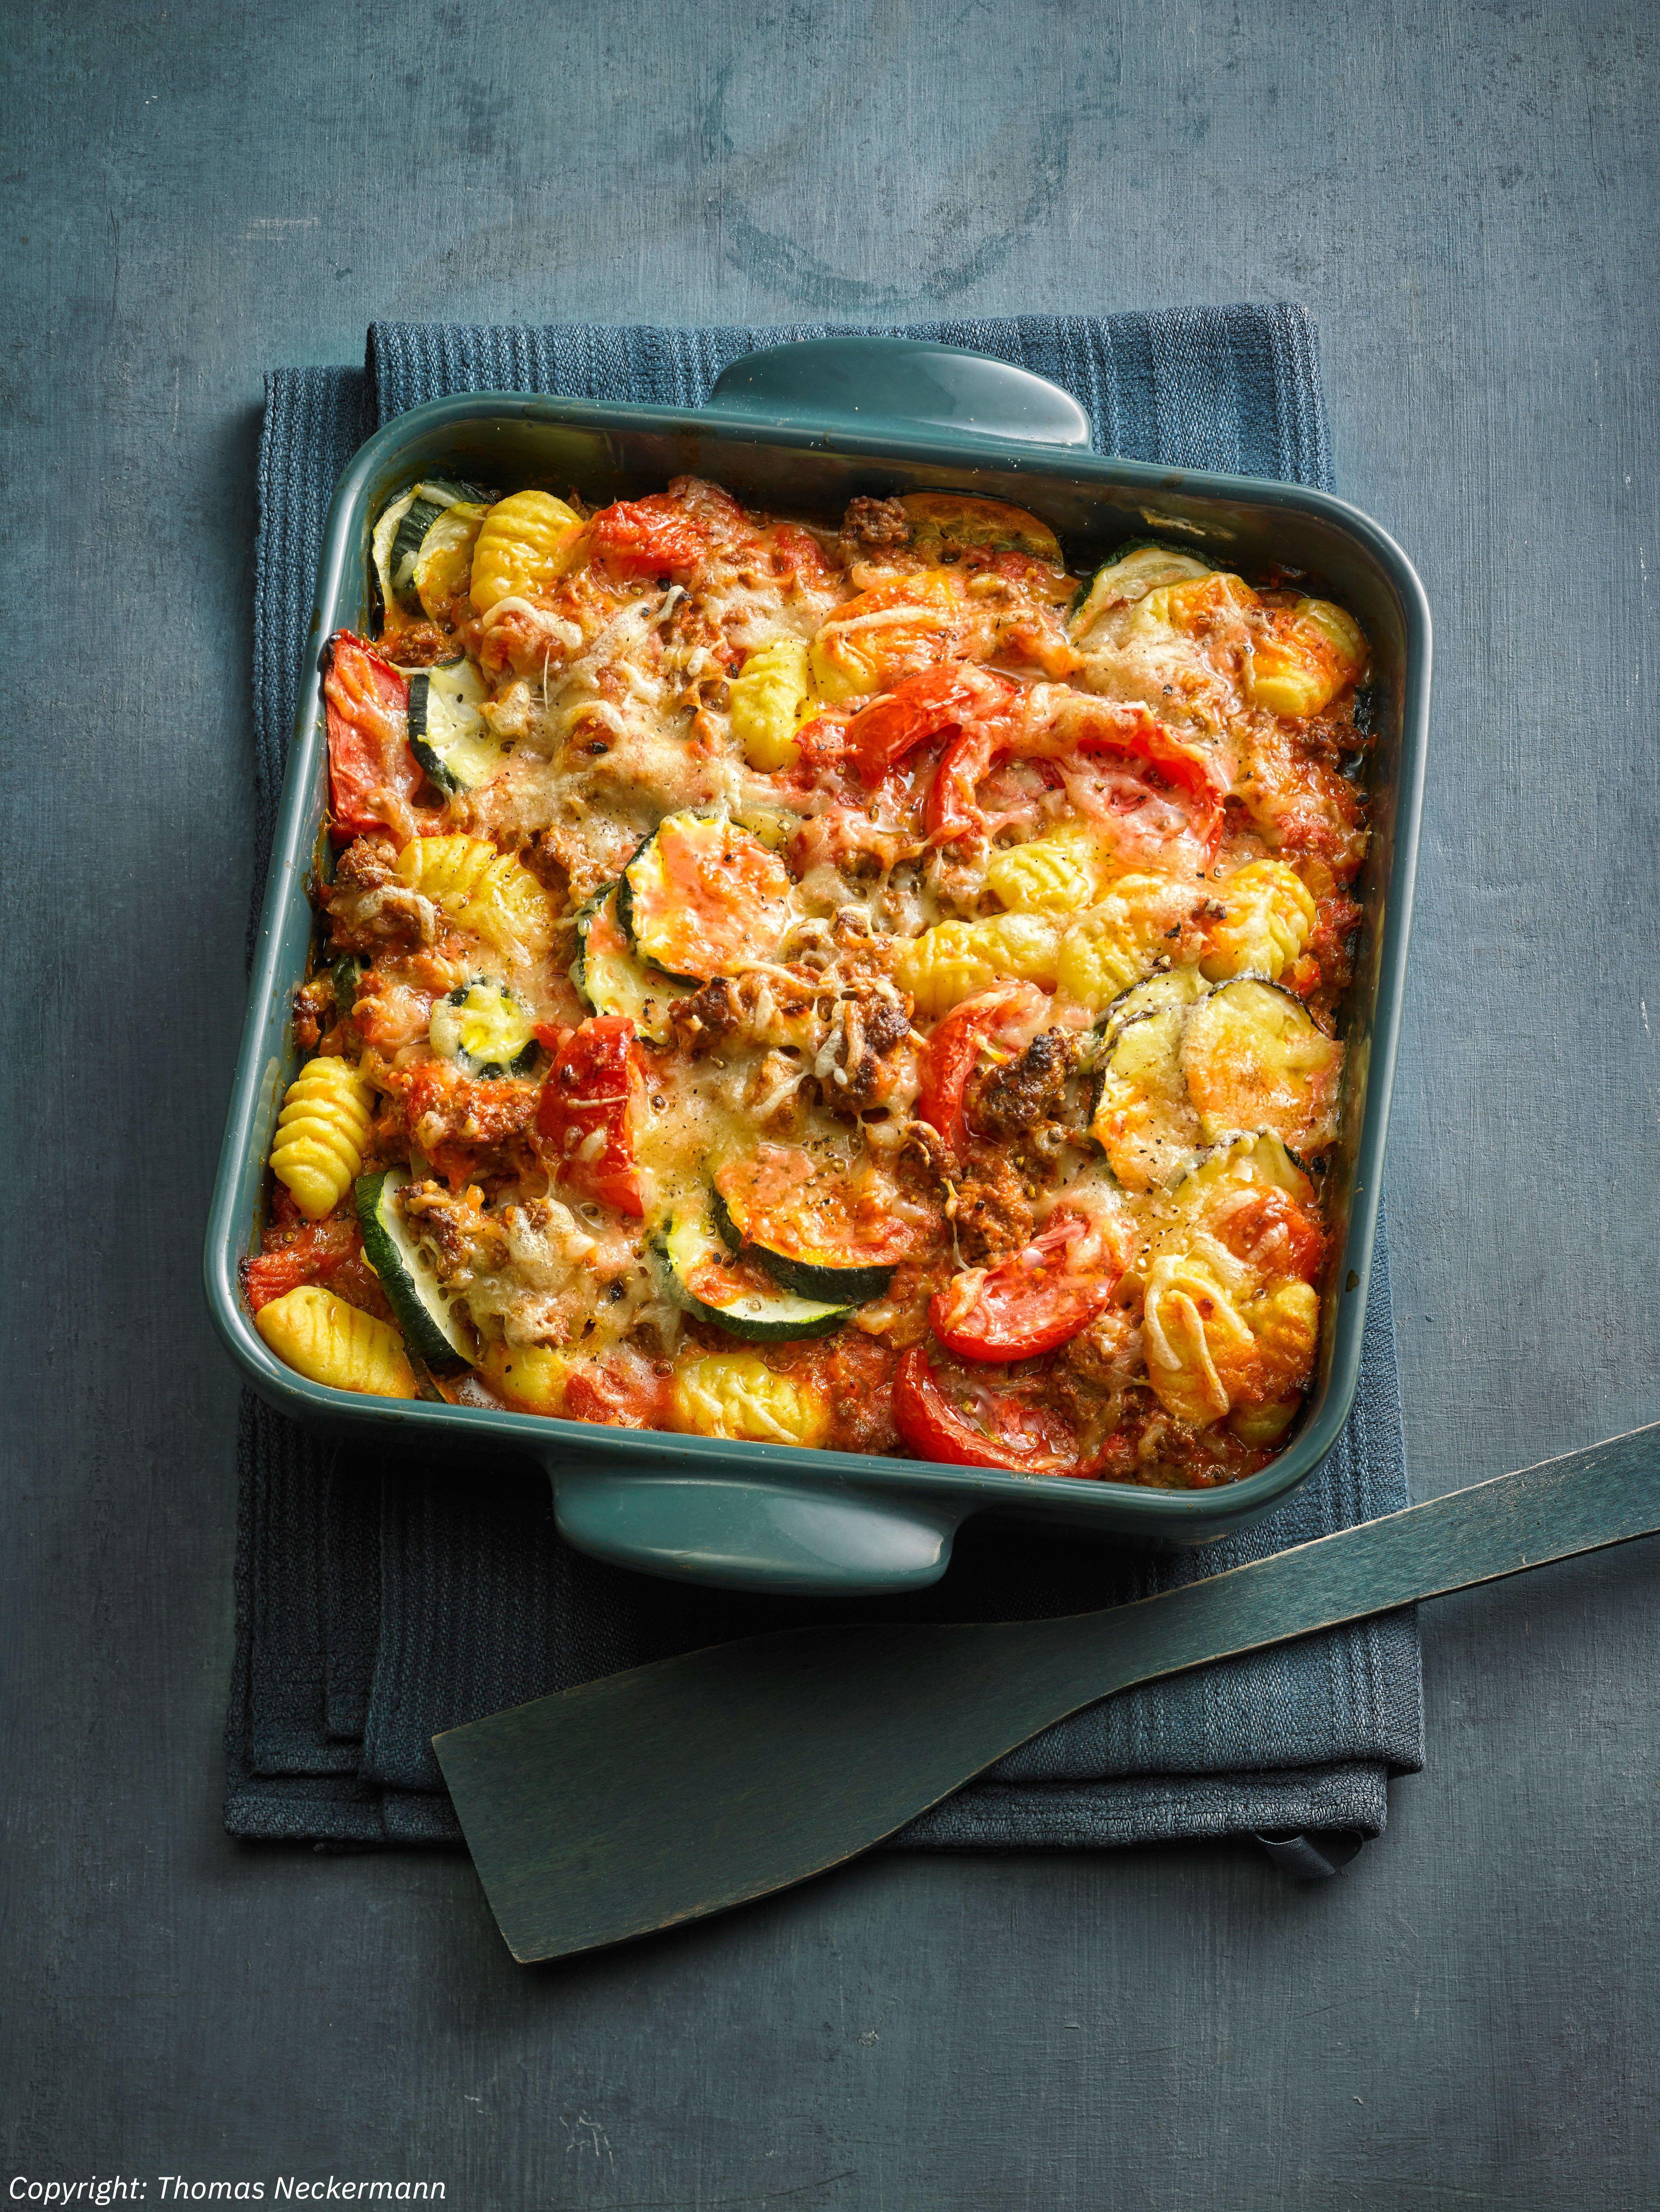 Photo of Courgette and Gnocchi Casserole by LadyRadnor | chef